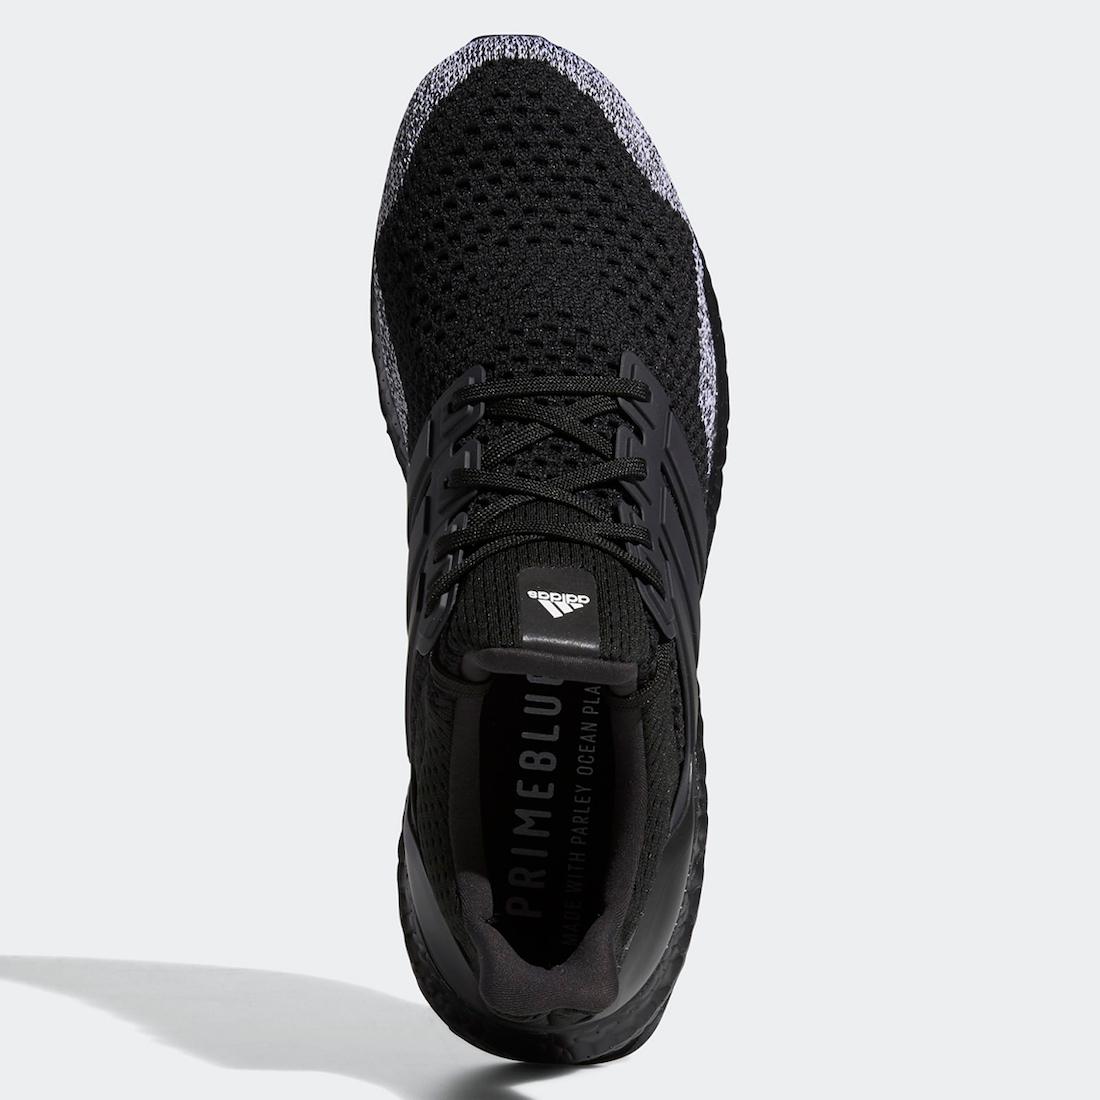 adidas UltraBOOST Oreo Toe GZ3150